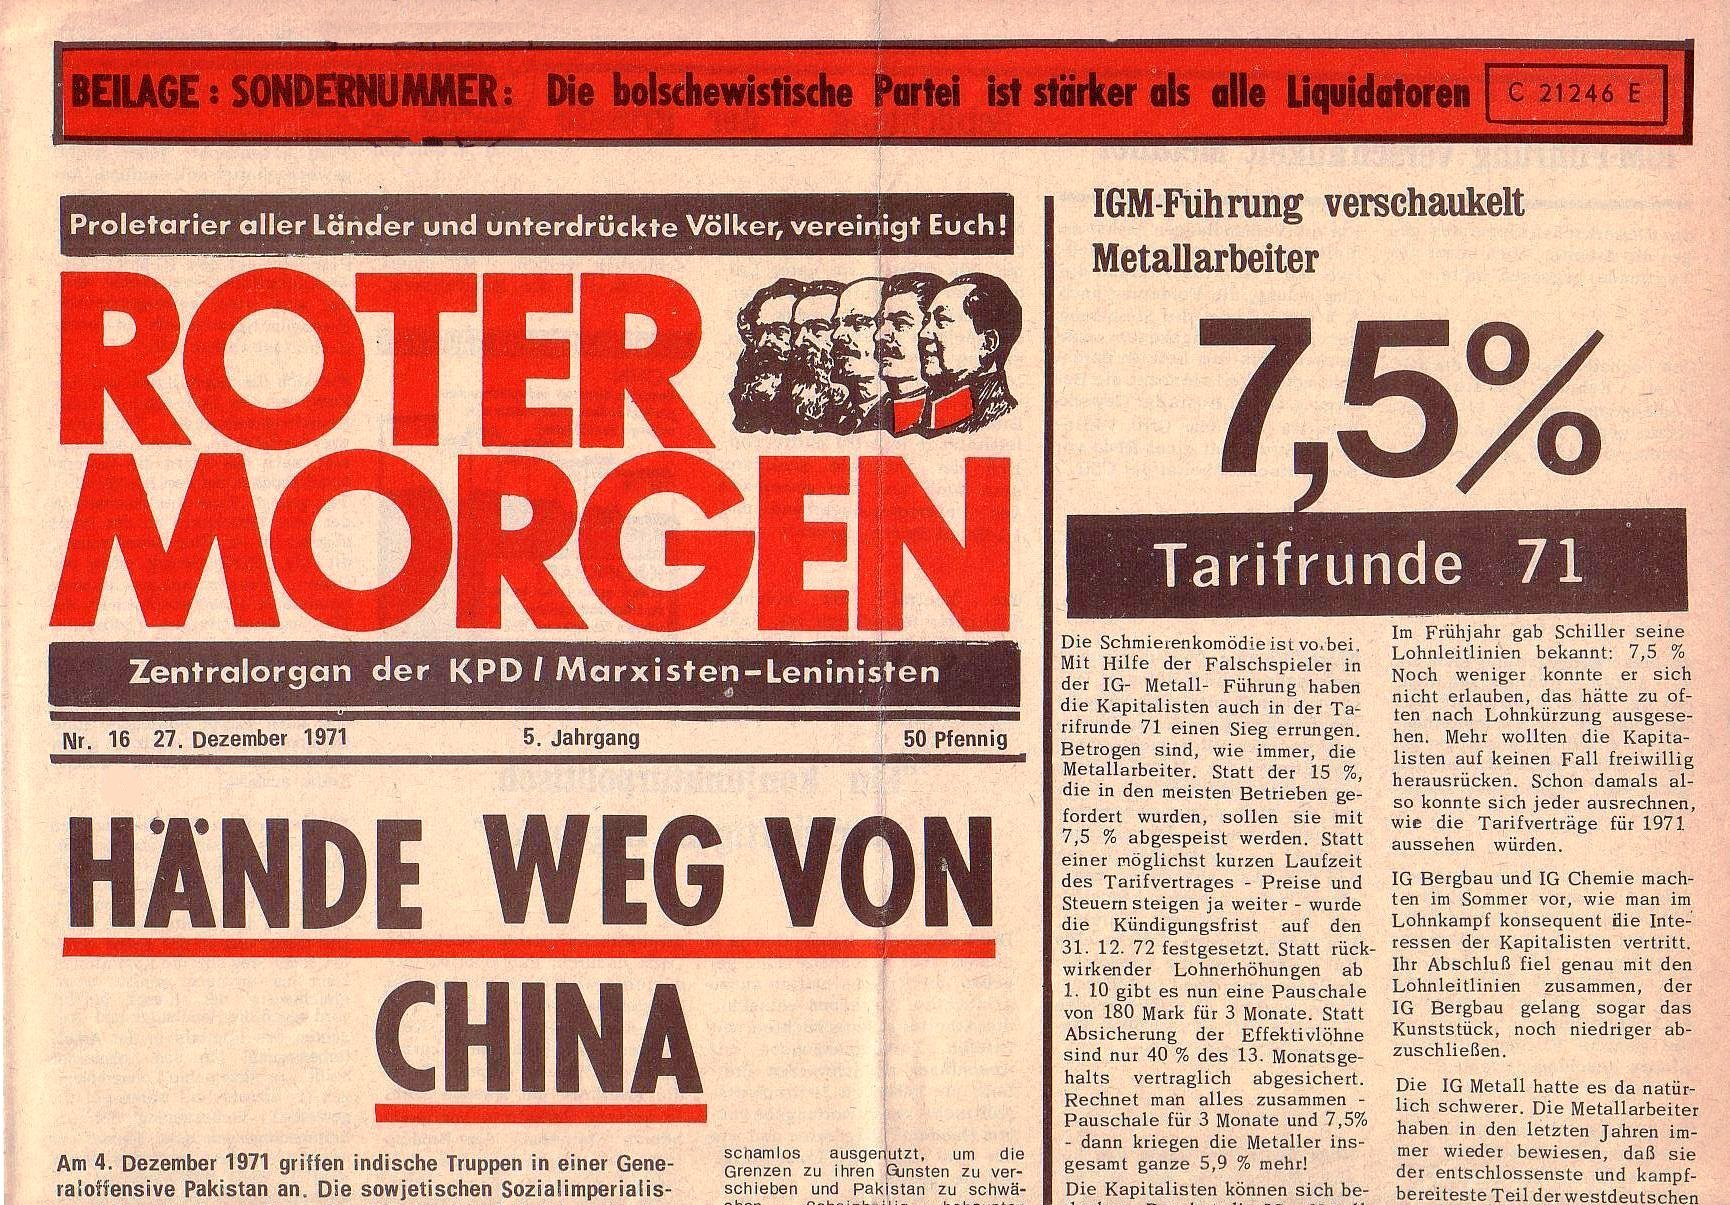 Roter Morgen, 5. Jg., 27. Dezember 1971, Nr. 16, Seite 1a